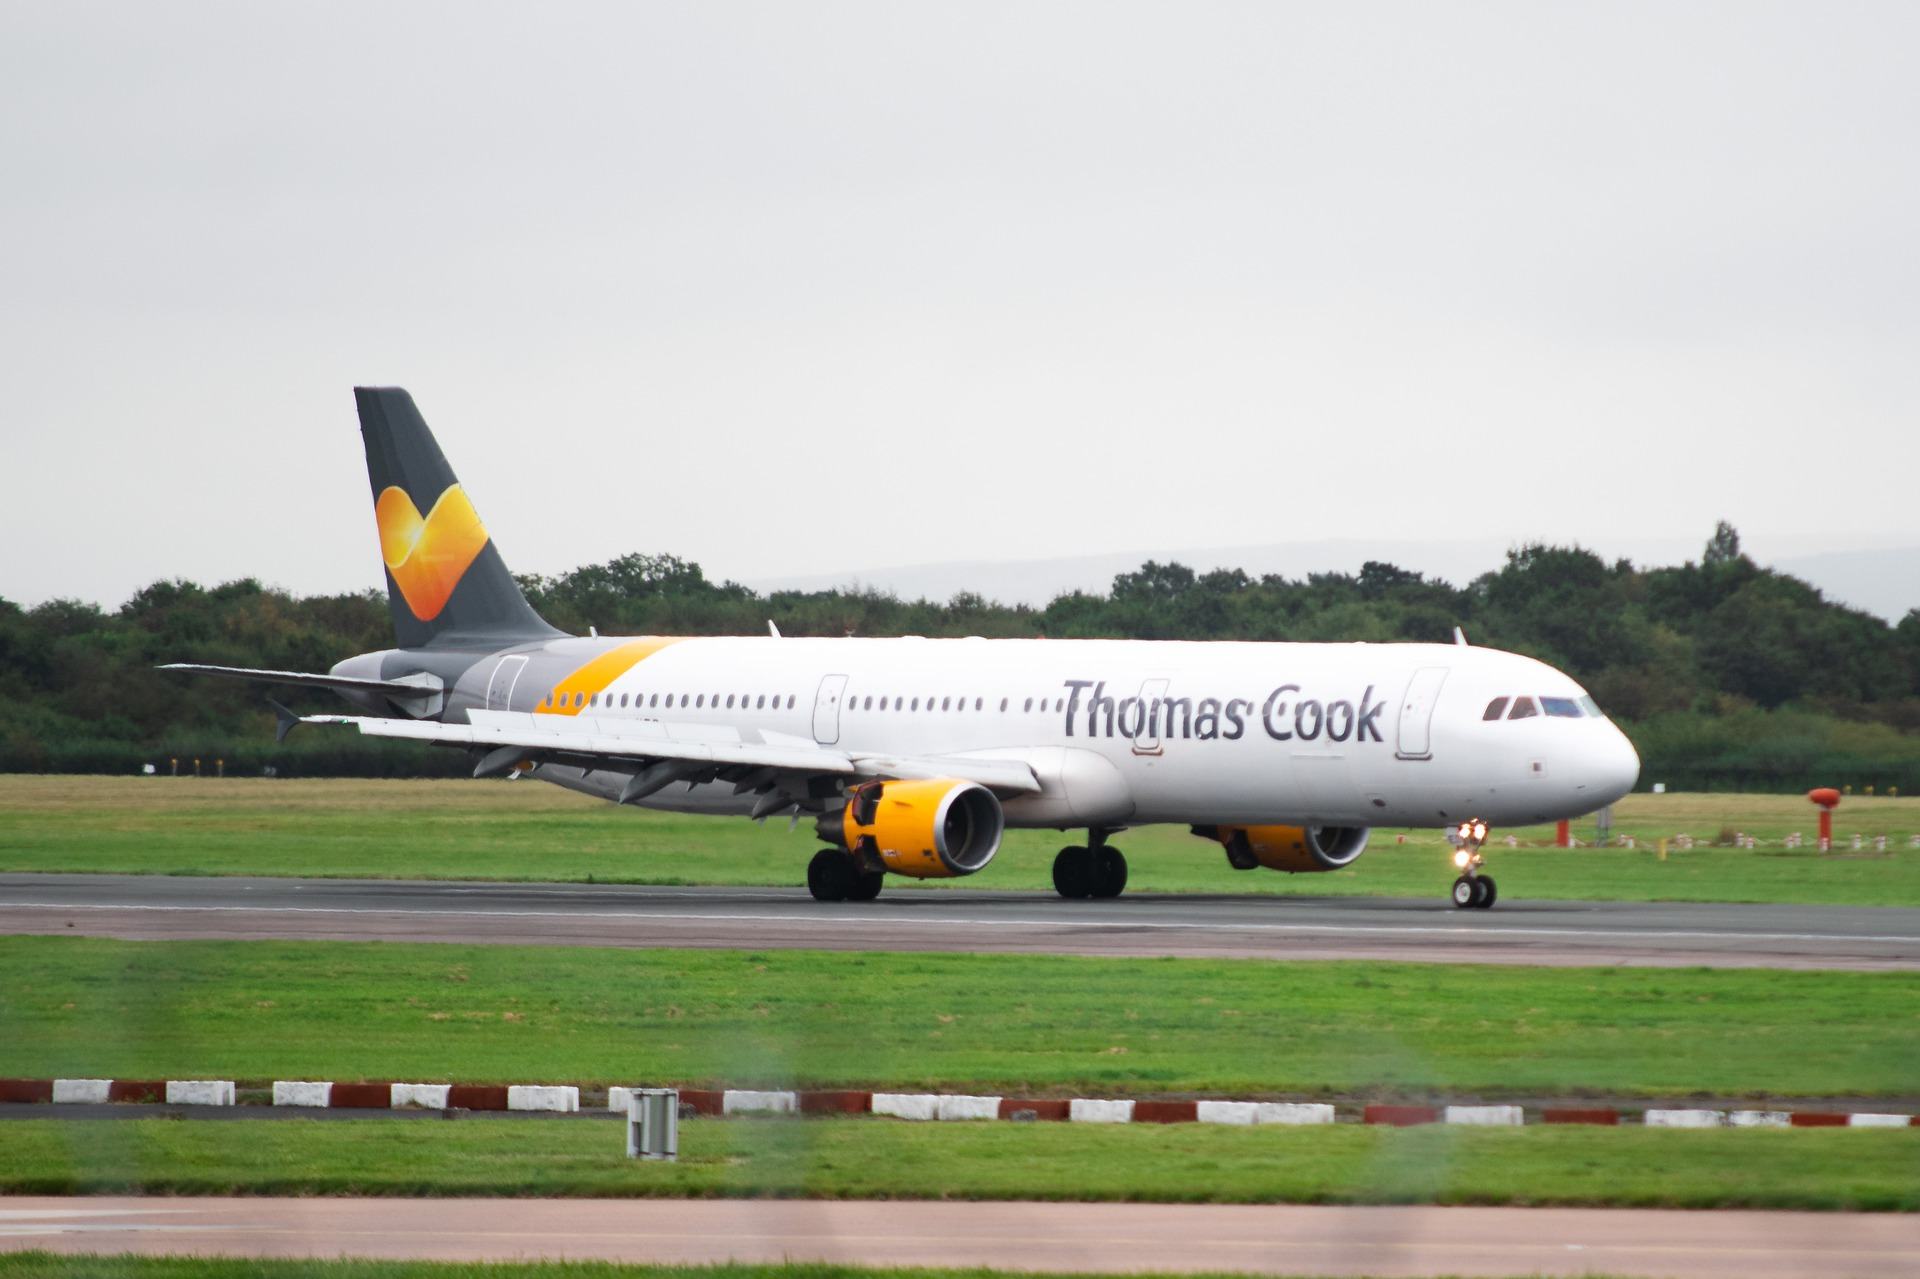 A Thomas Cook plane lands.